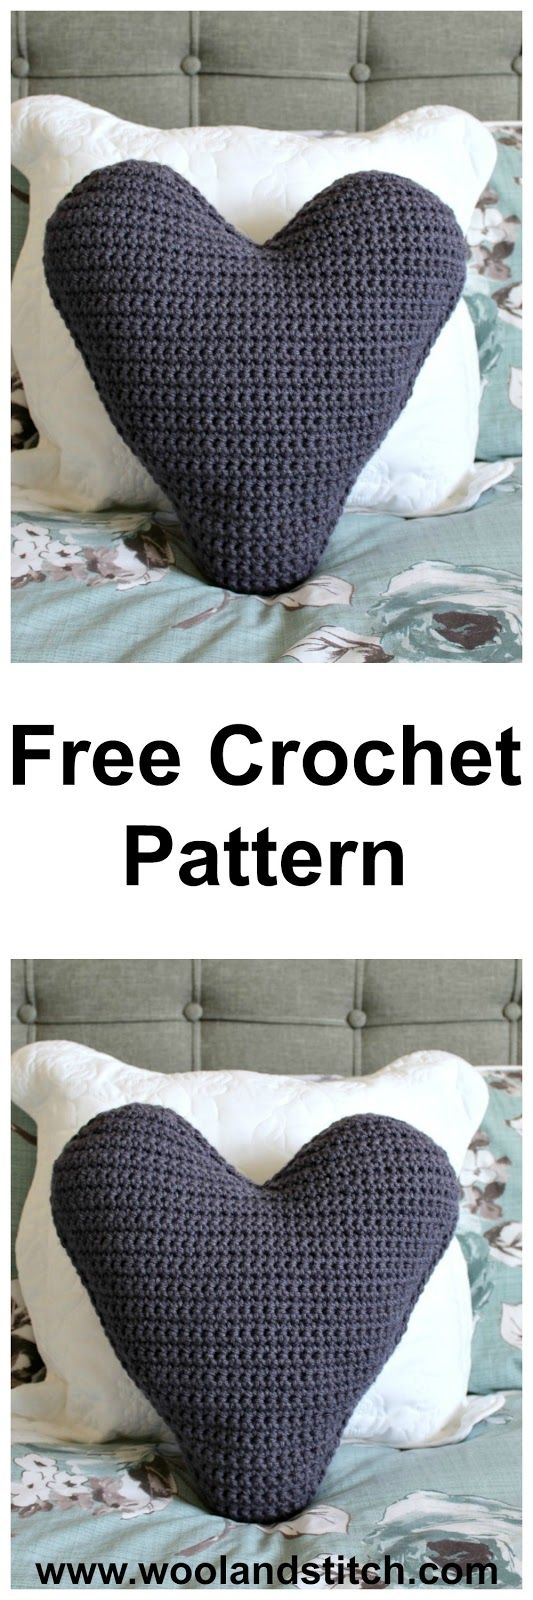 Chunky Heart Cushion - Free Crochet Pattern